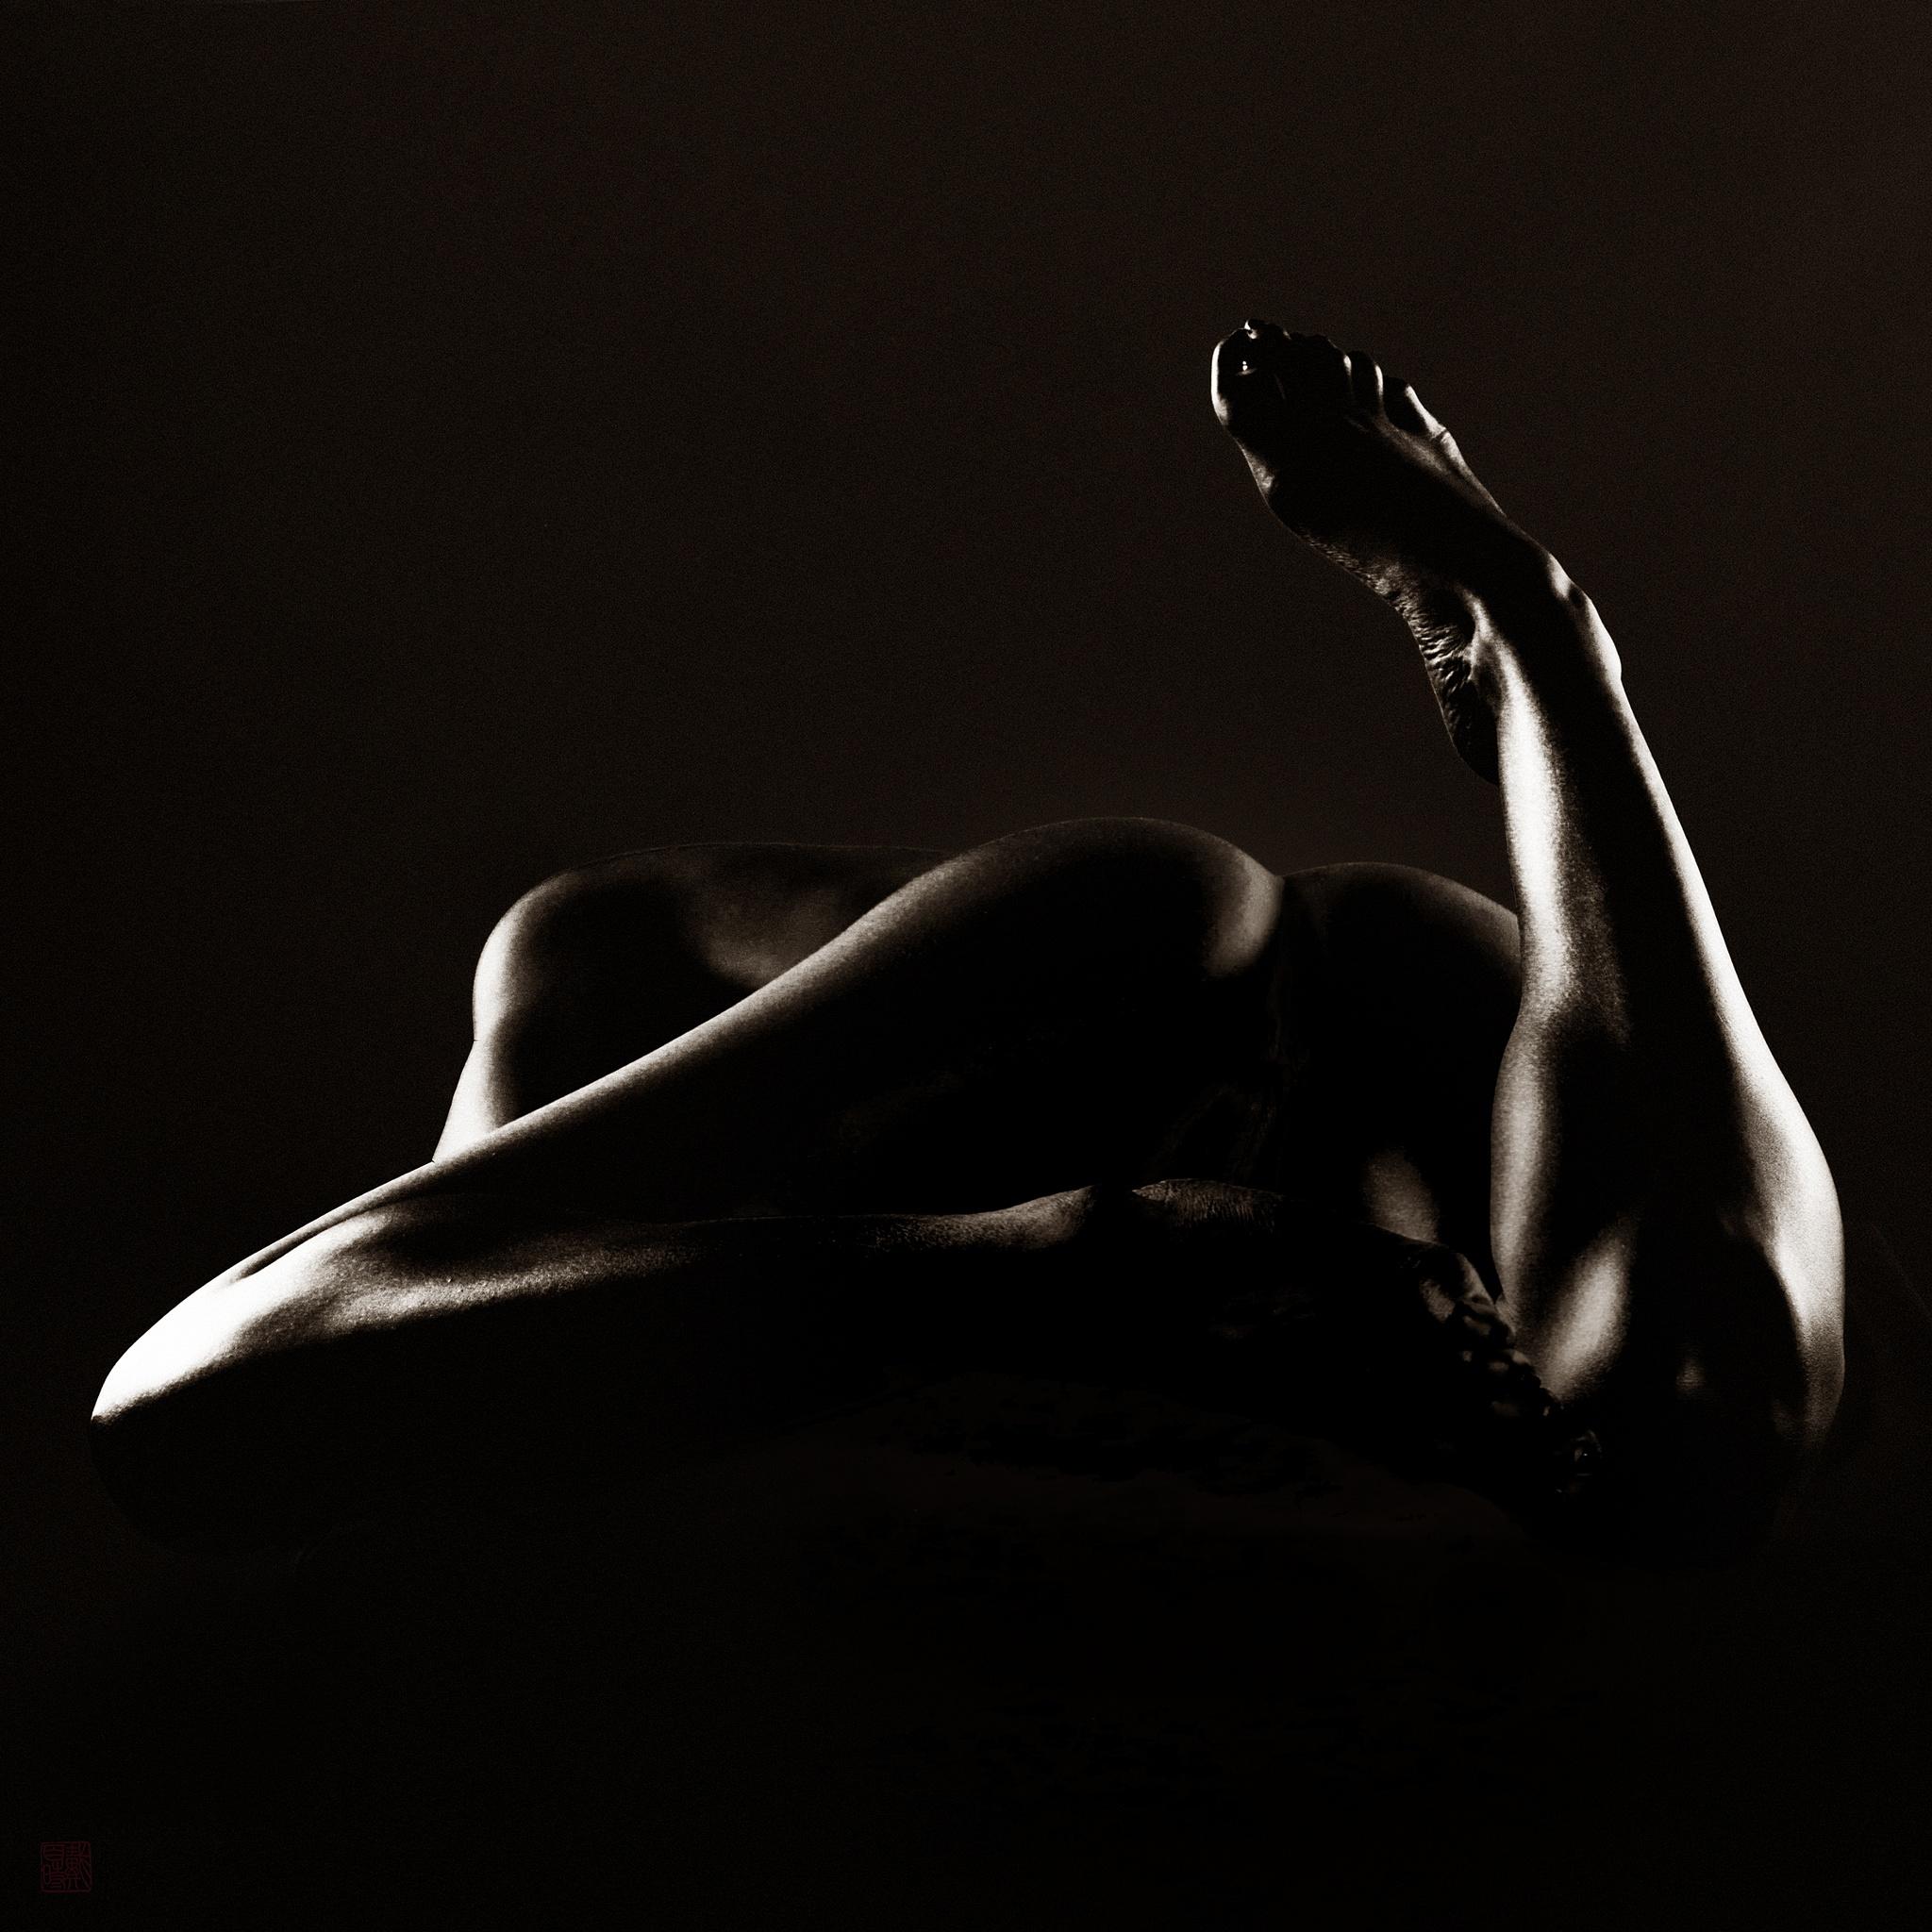 Black light by delmotte